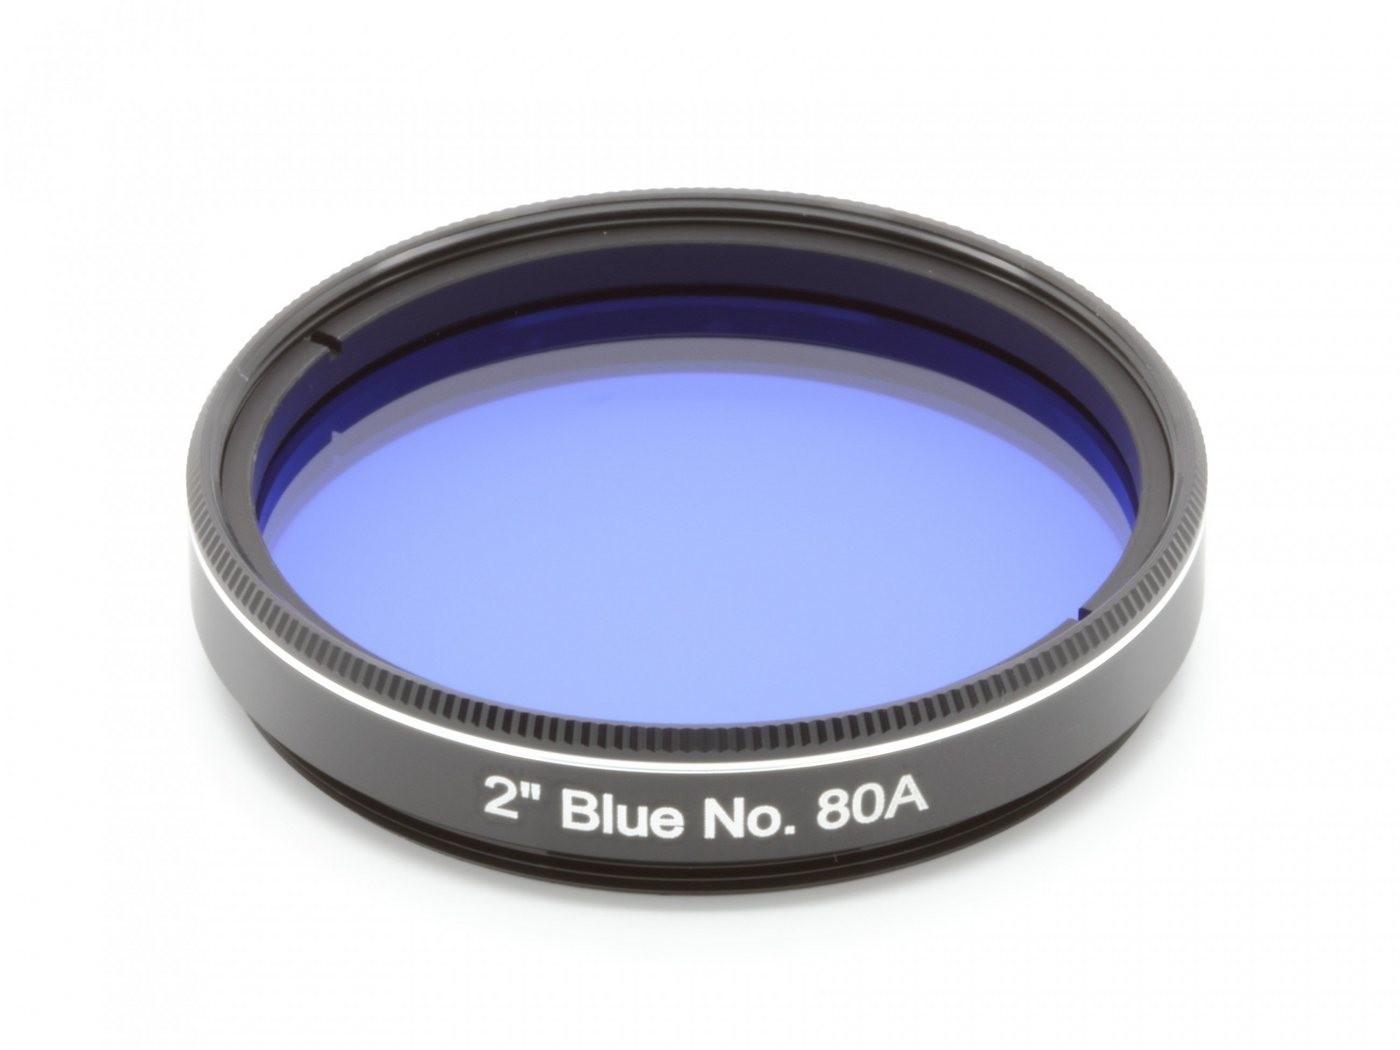 Image of Explore Scientific Blue 80A